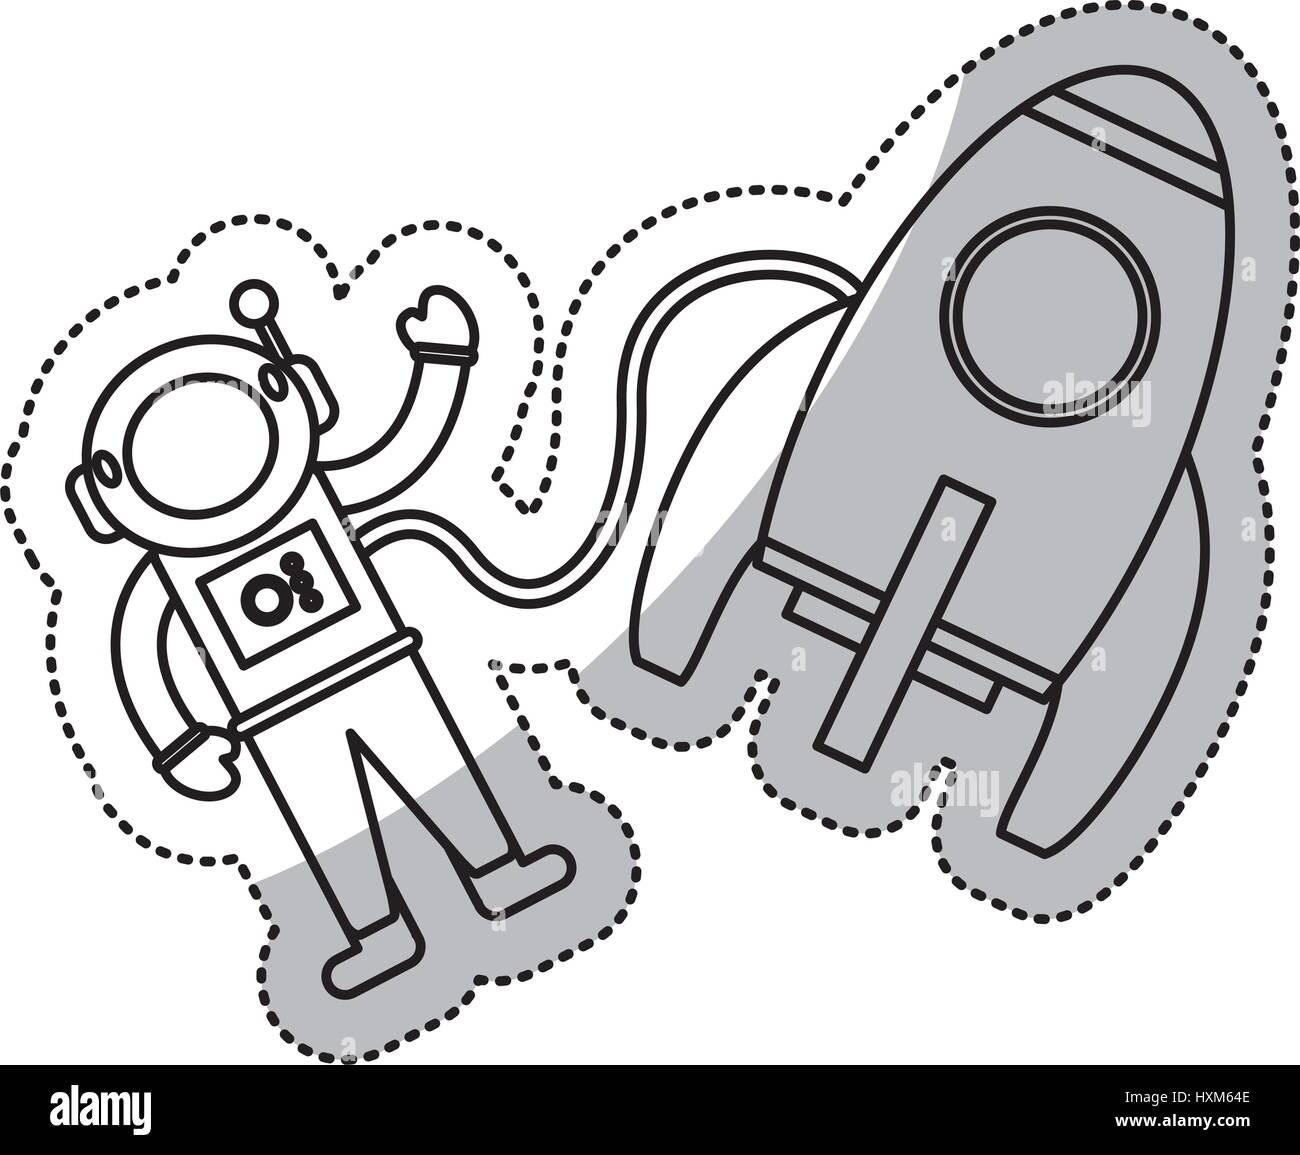 astronaut rocket exploration outline stock vector art